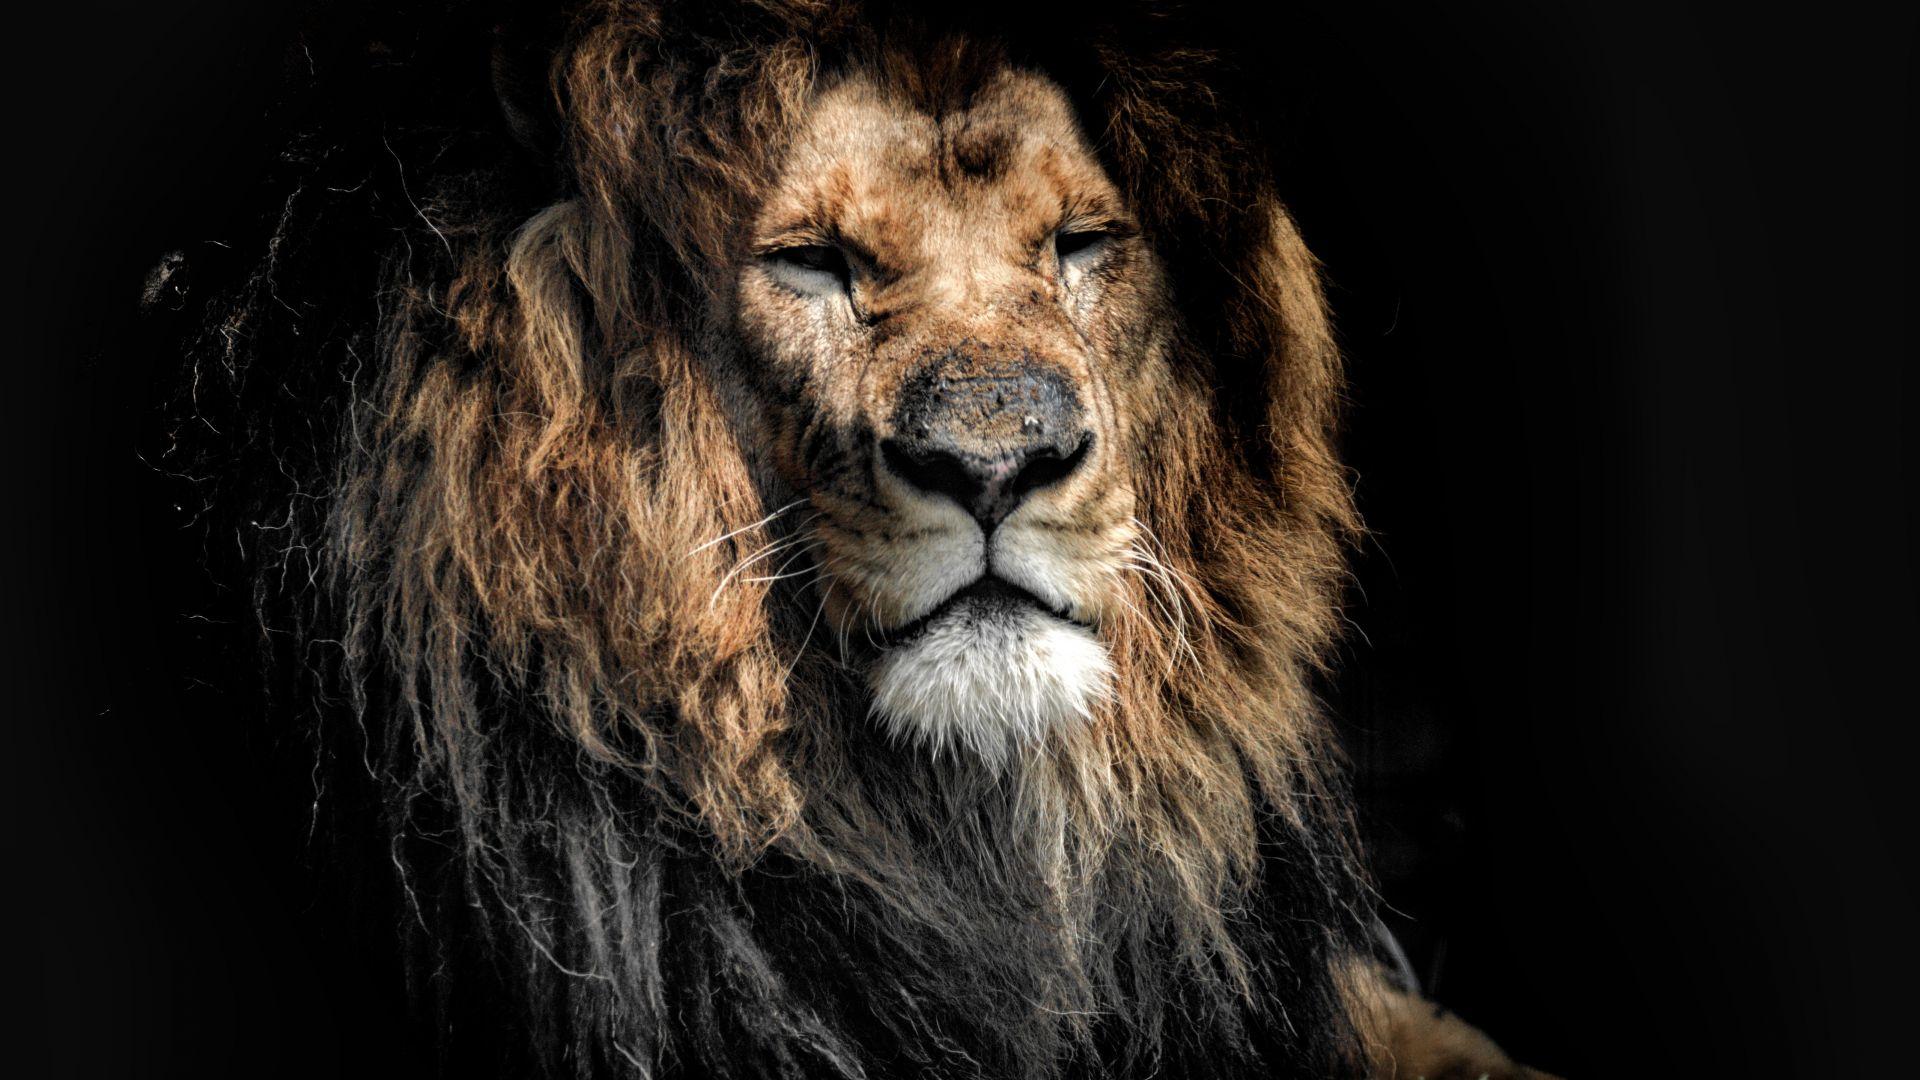 Desktop Wallpaper Aged Lion Beast Predator Muzzle 4k Hd